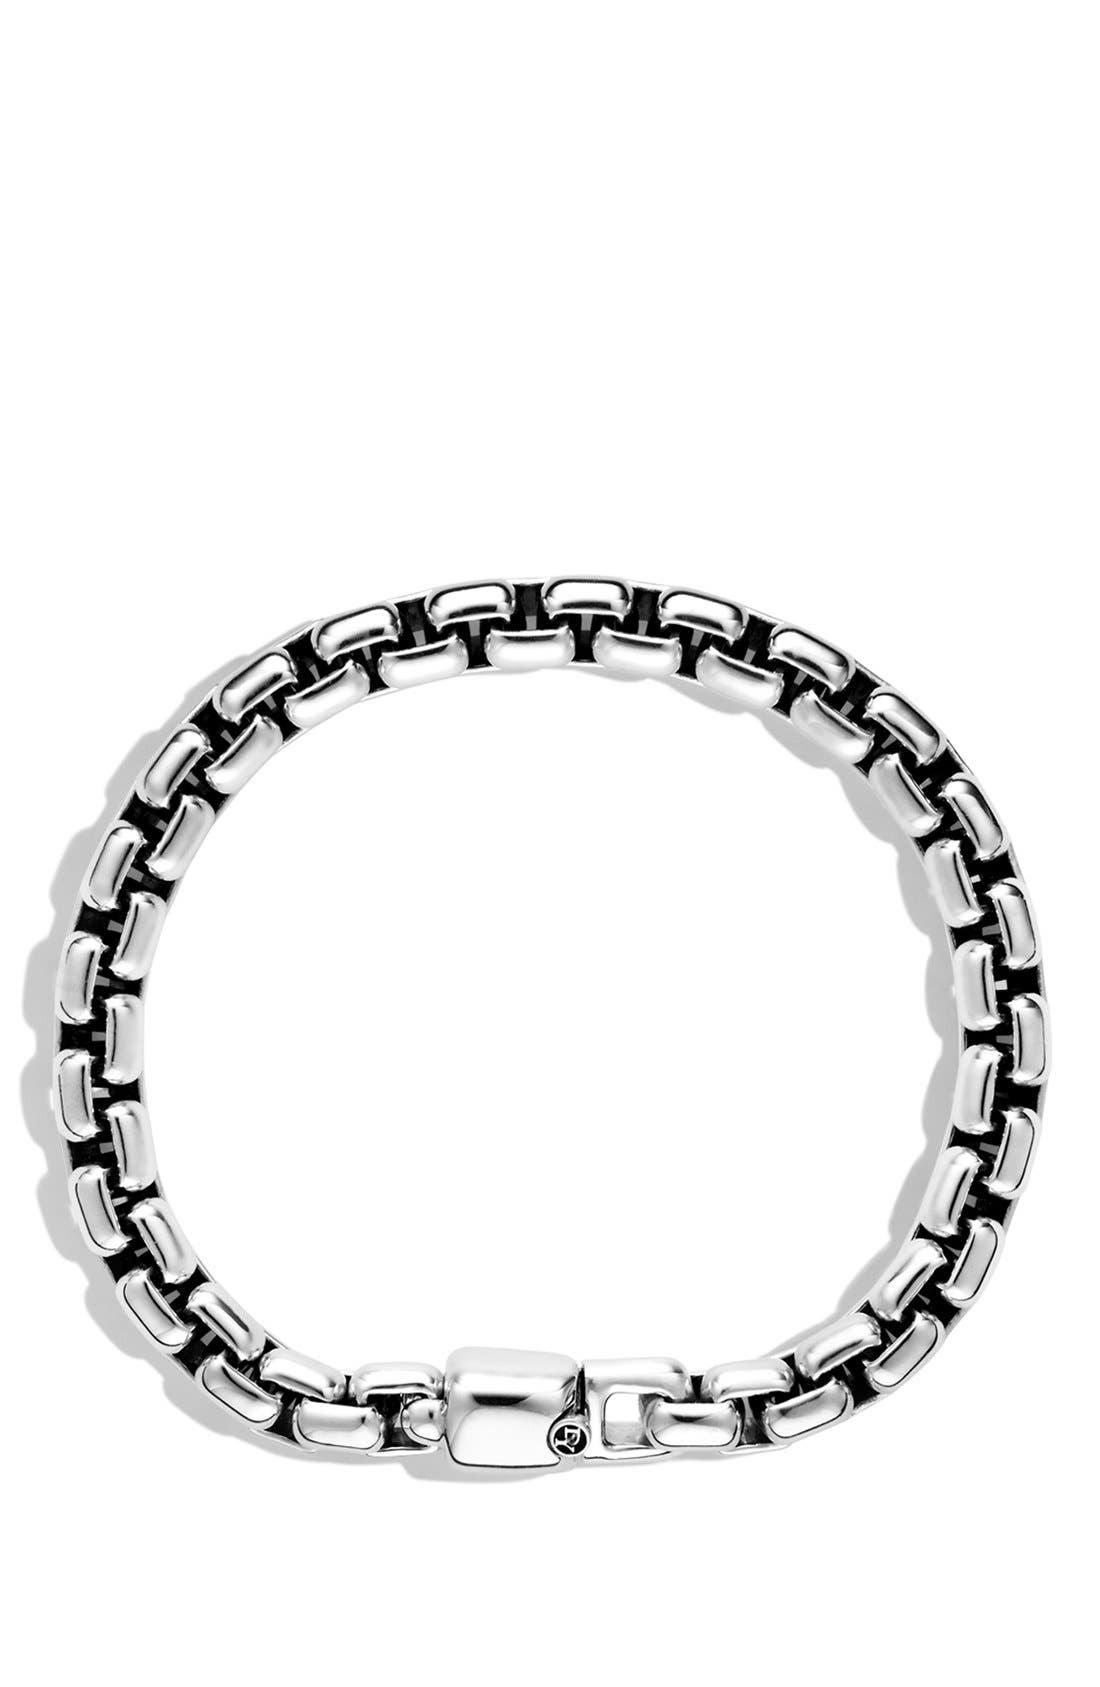 Alternate Image 2  - David Yurman 'Chain' Box Chain Bracelet